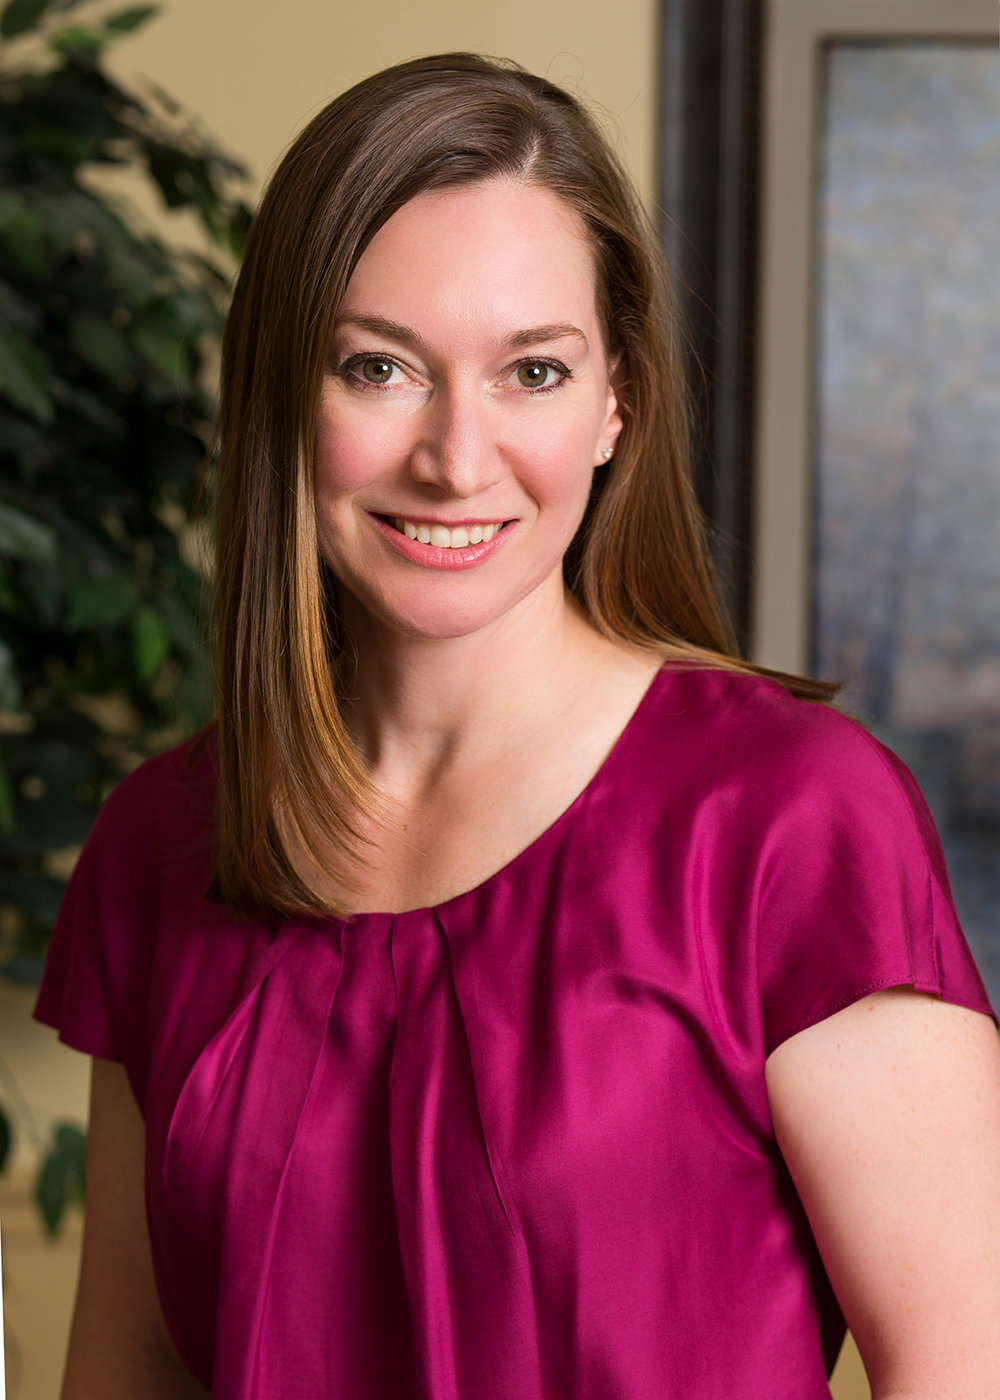 Heather D. Rupe, D.O.